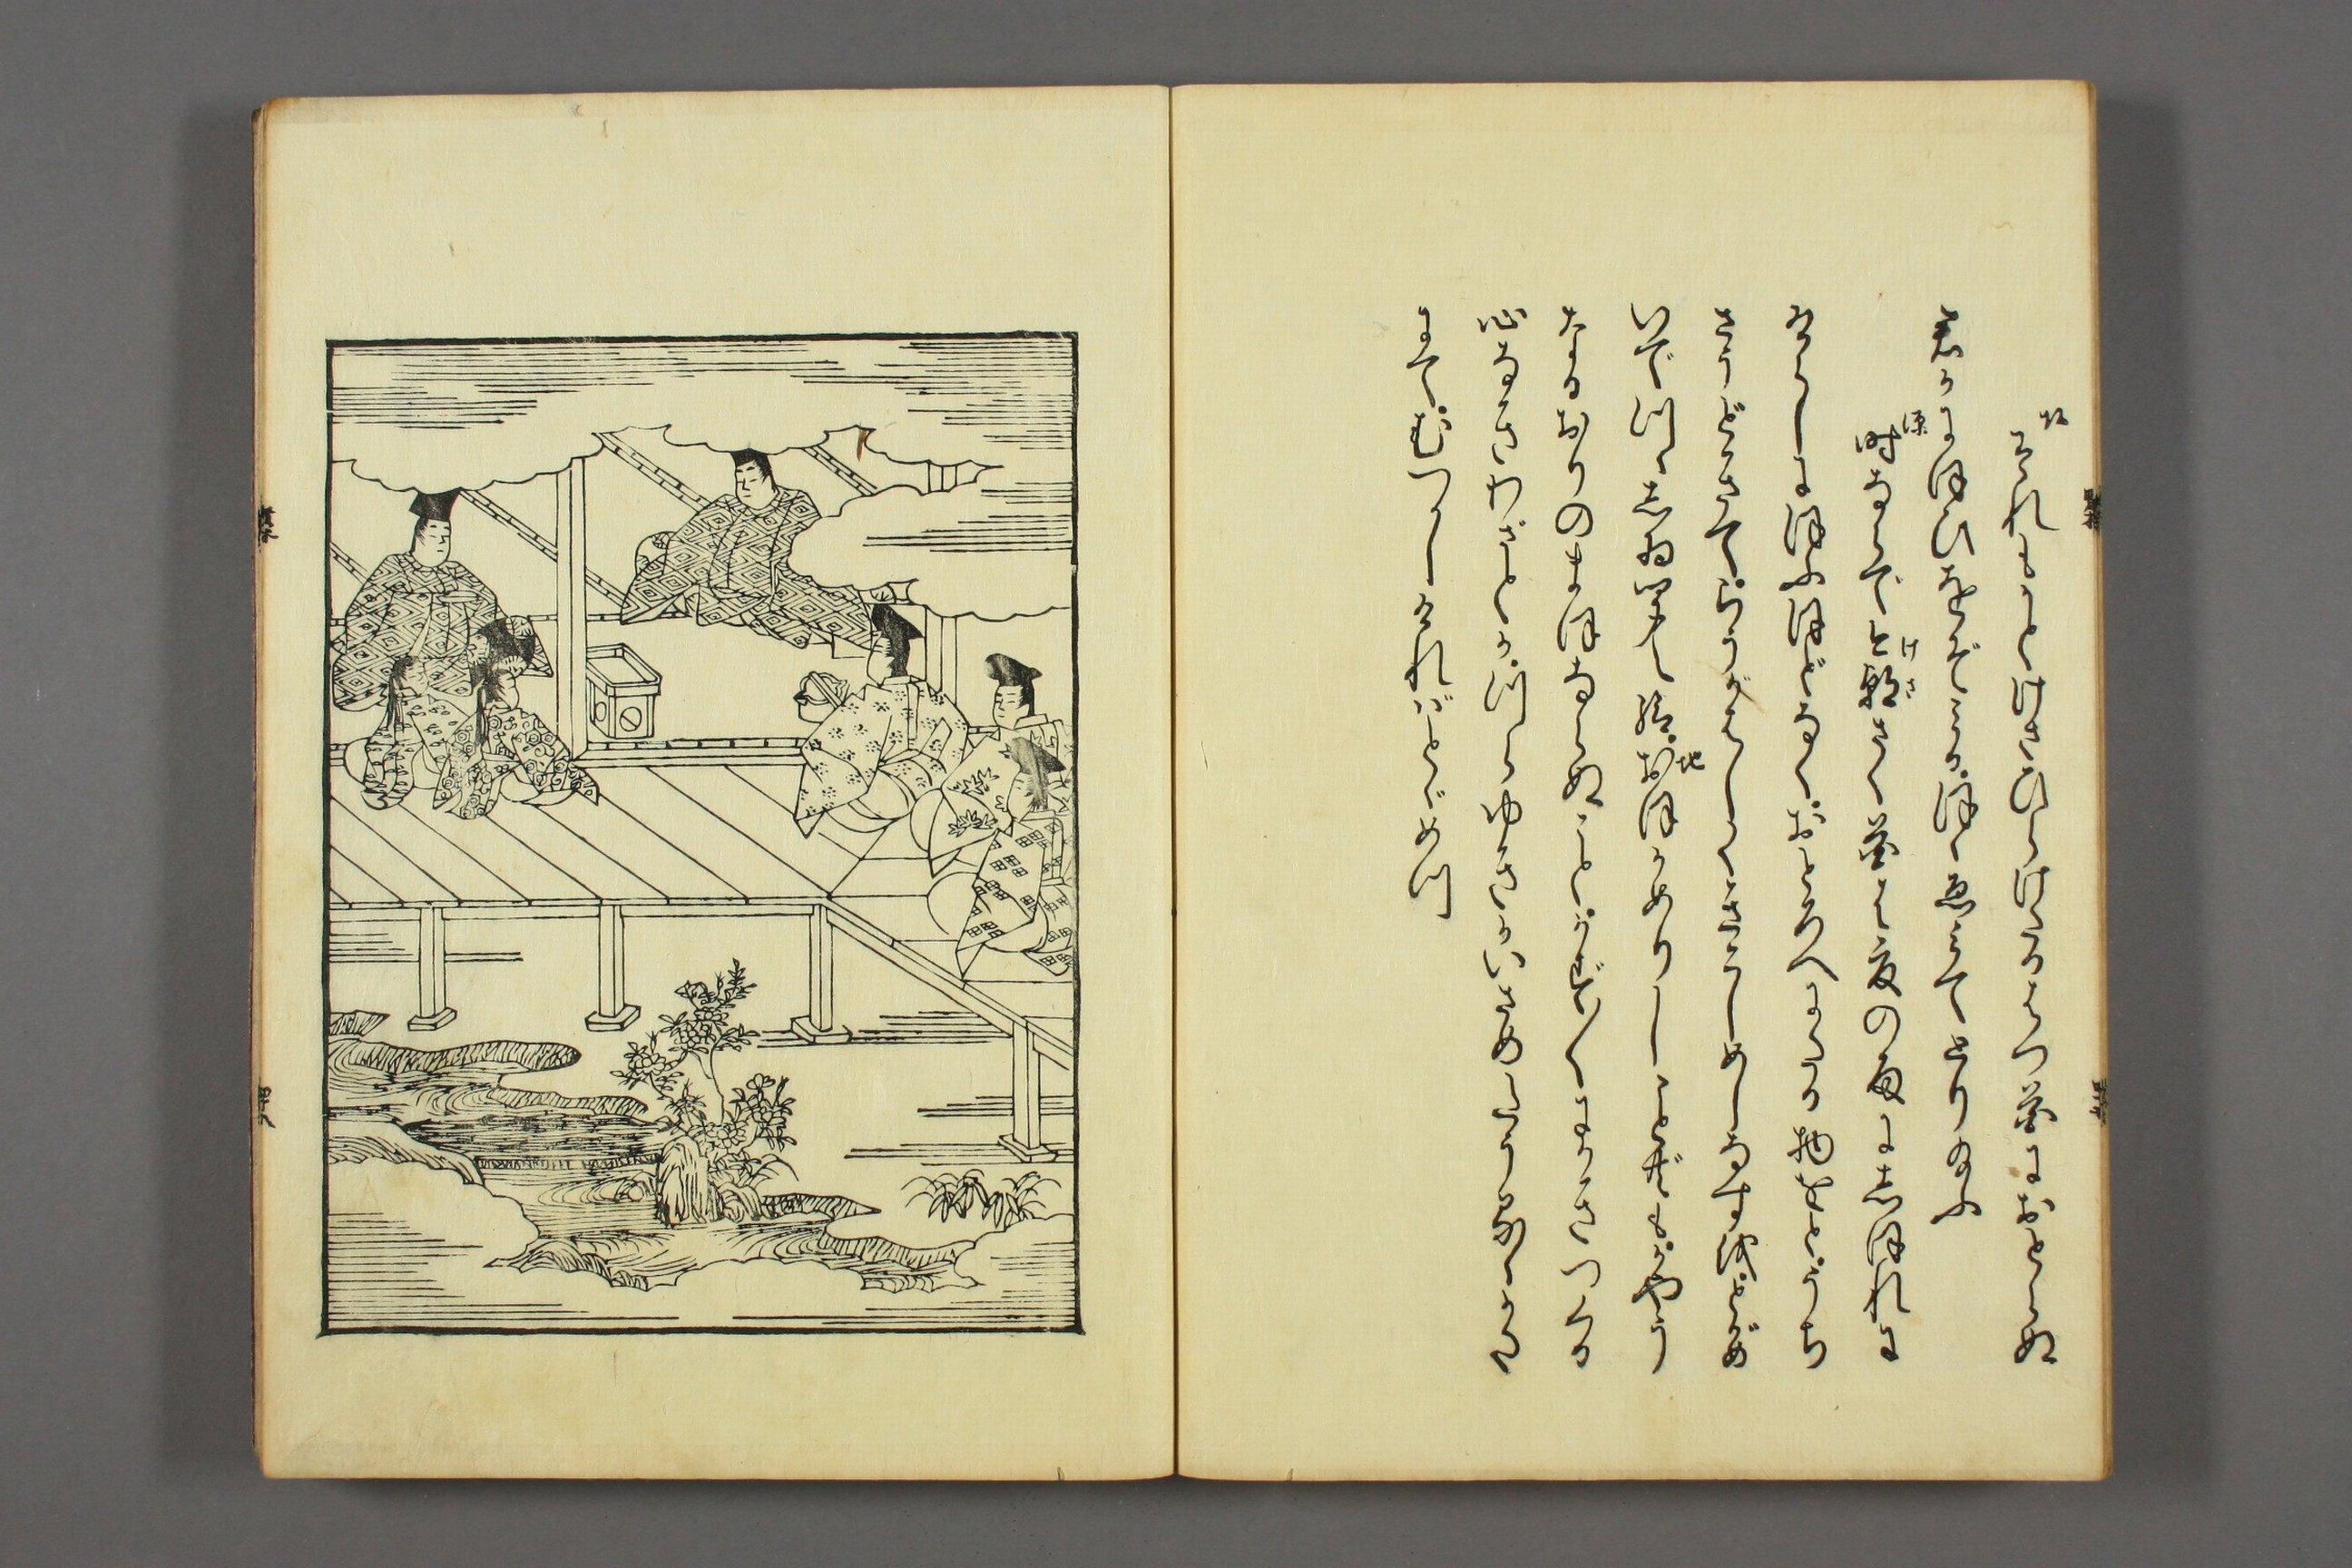 http://archive.wul.waseda.ac.jp/kosho/bunko30/bunko30_a0007/bunko30_a0007_0010/bunko30_a0007_0010_p0049.jpg